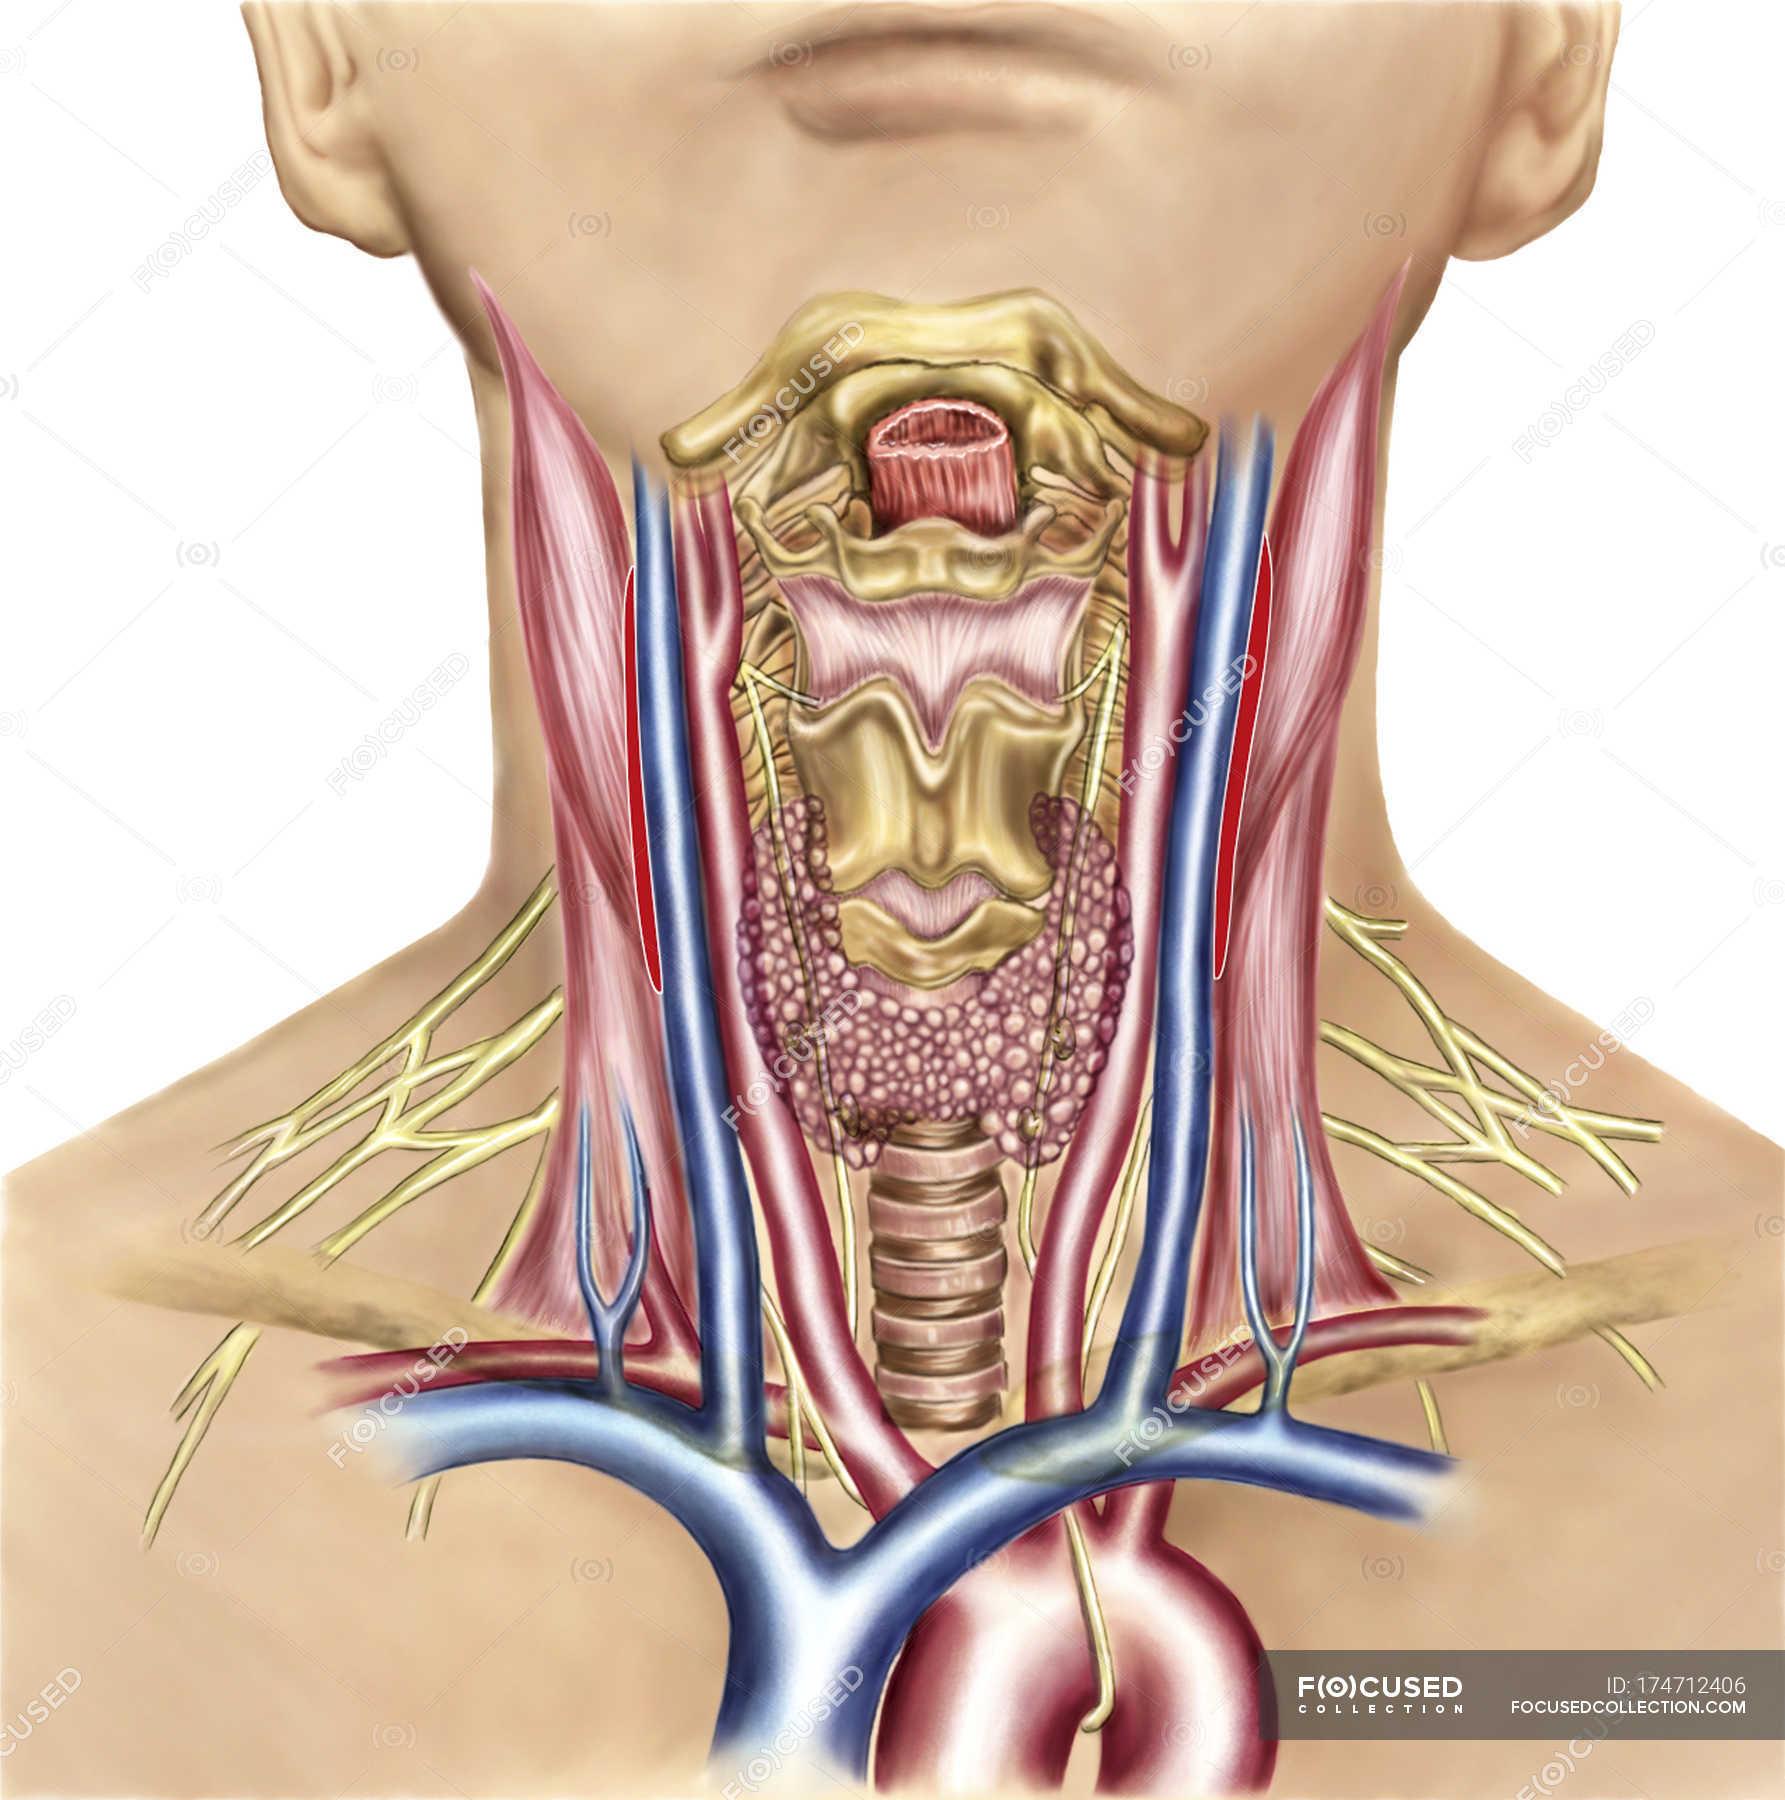 Neck anatomy showing arteries of pharyngeal region and thyroid ...